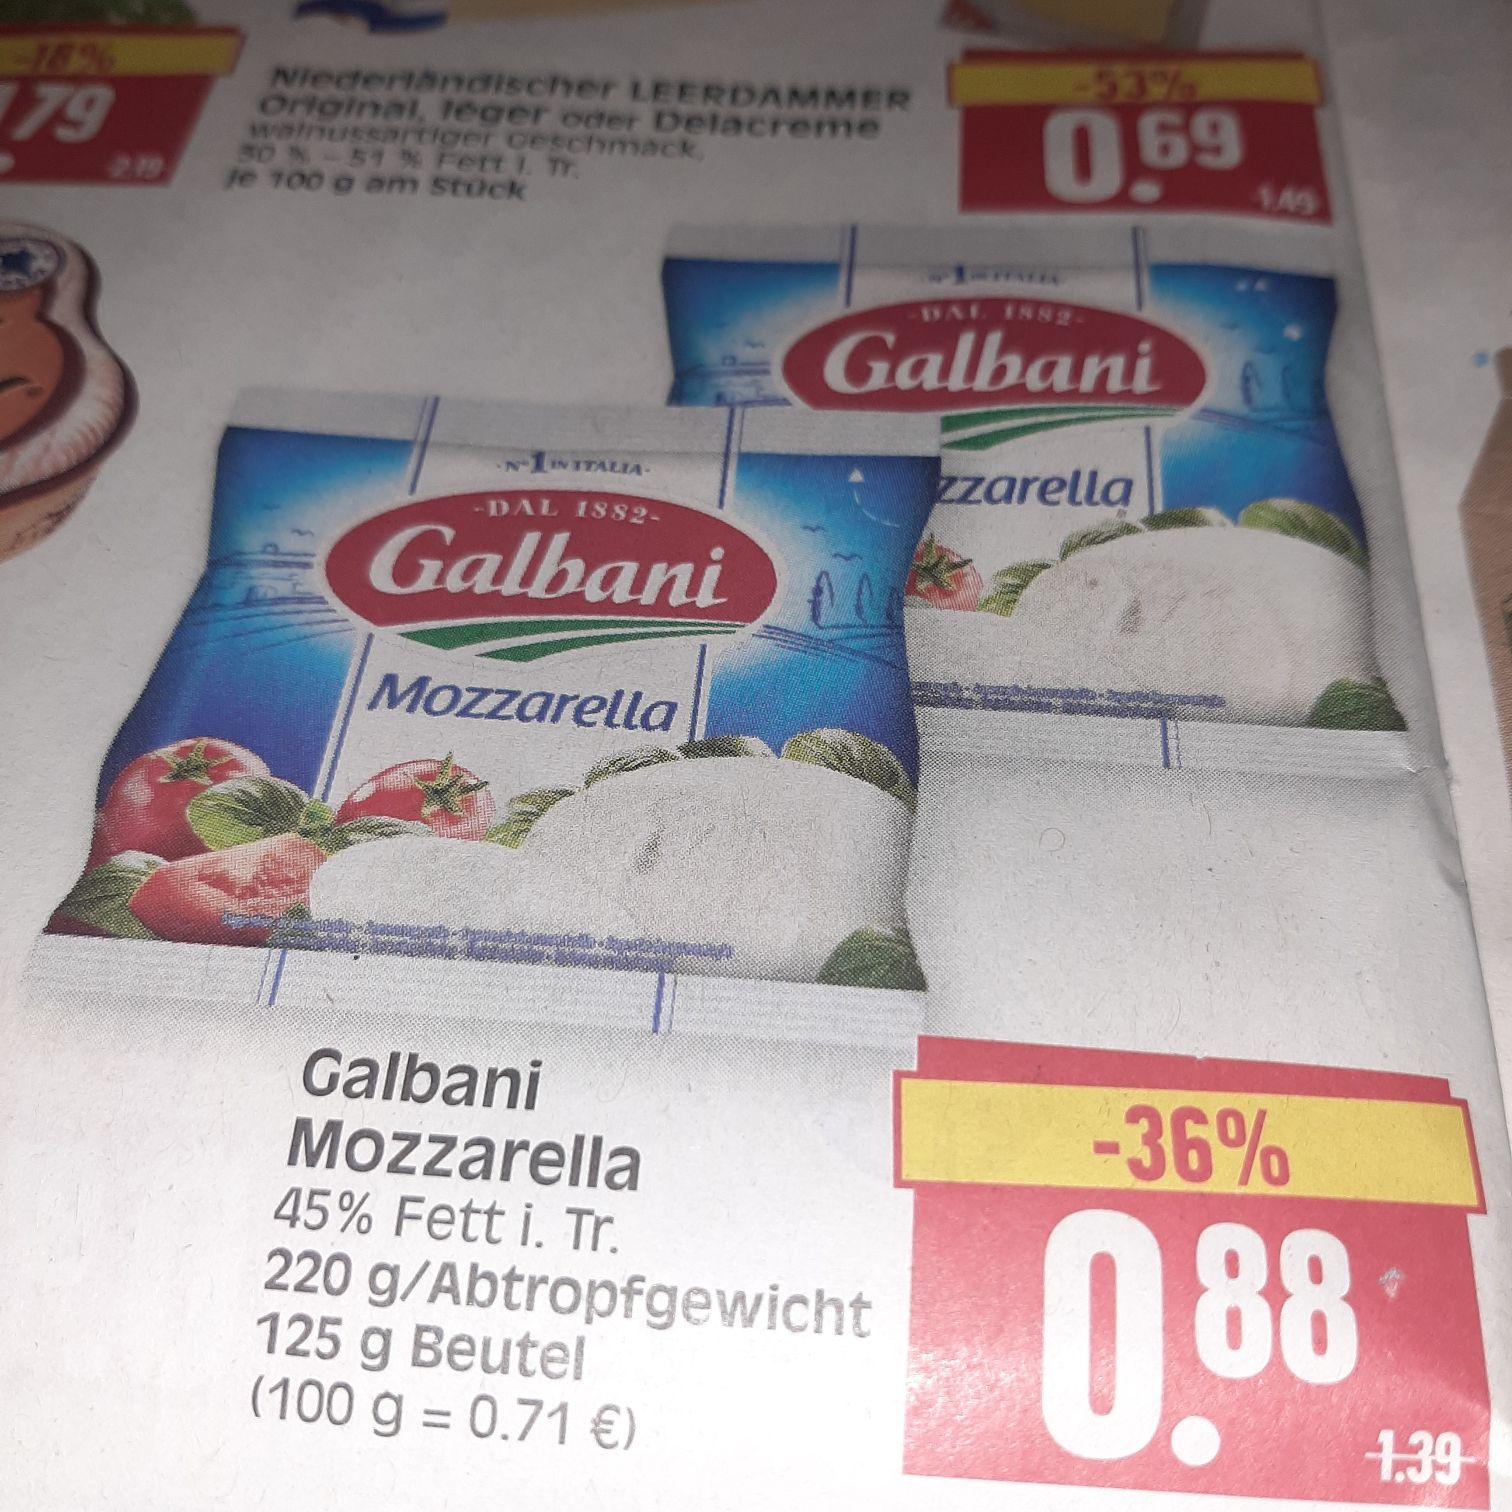 Edeka Center Herkules in Hessen Galbani Mozzarella Dank Coupon nur 0.38€.